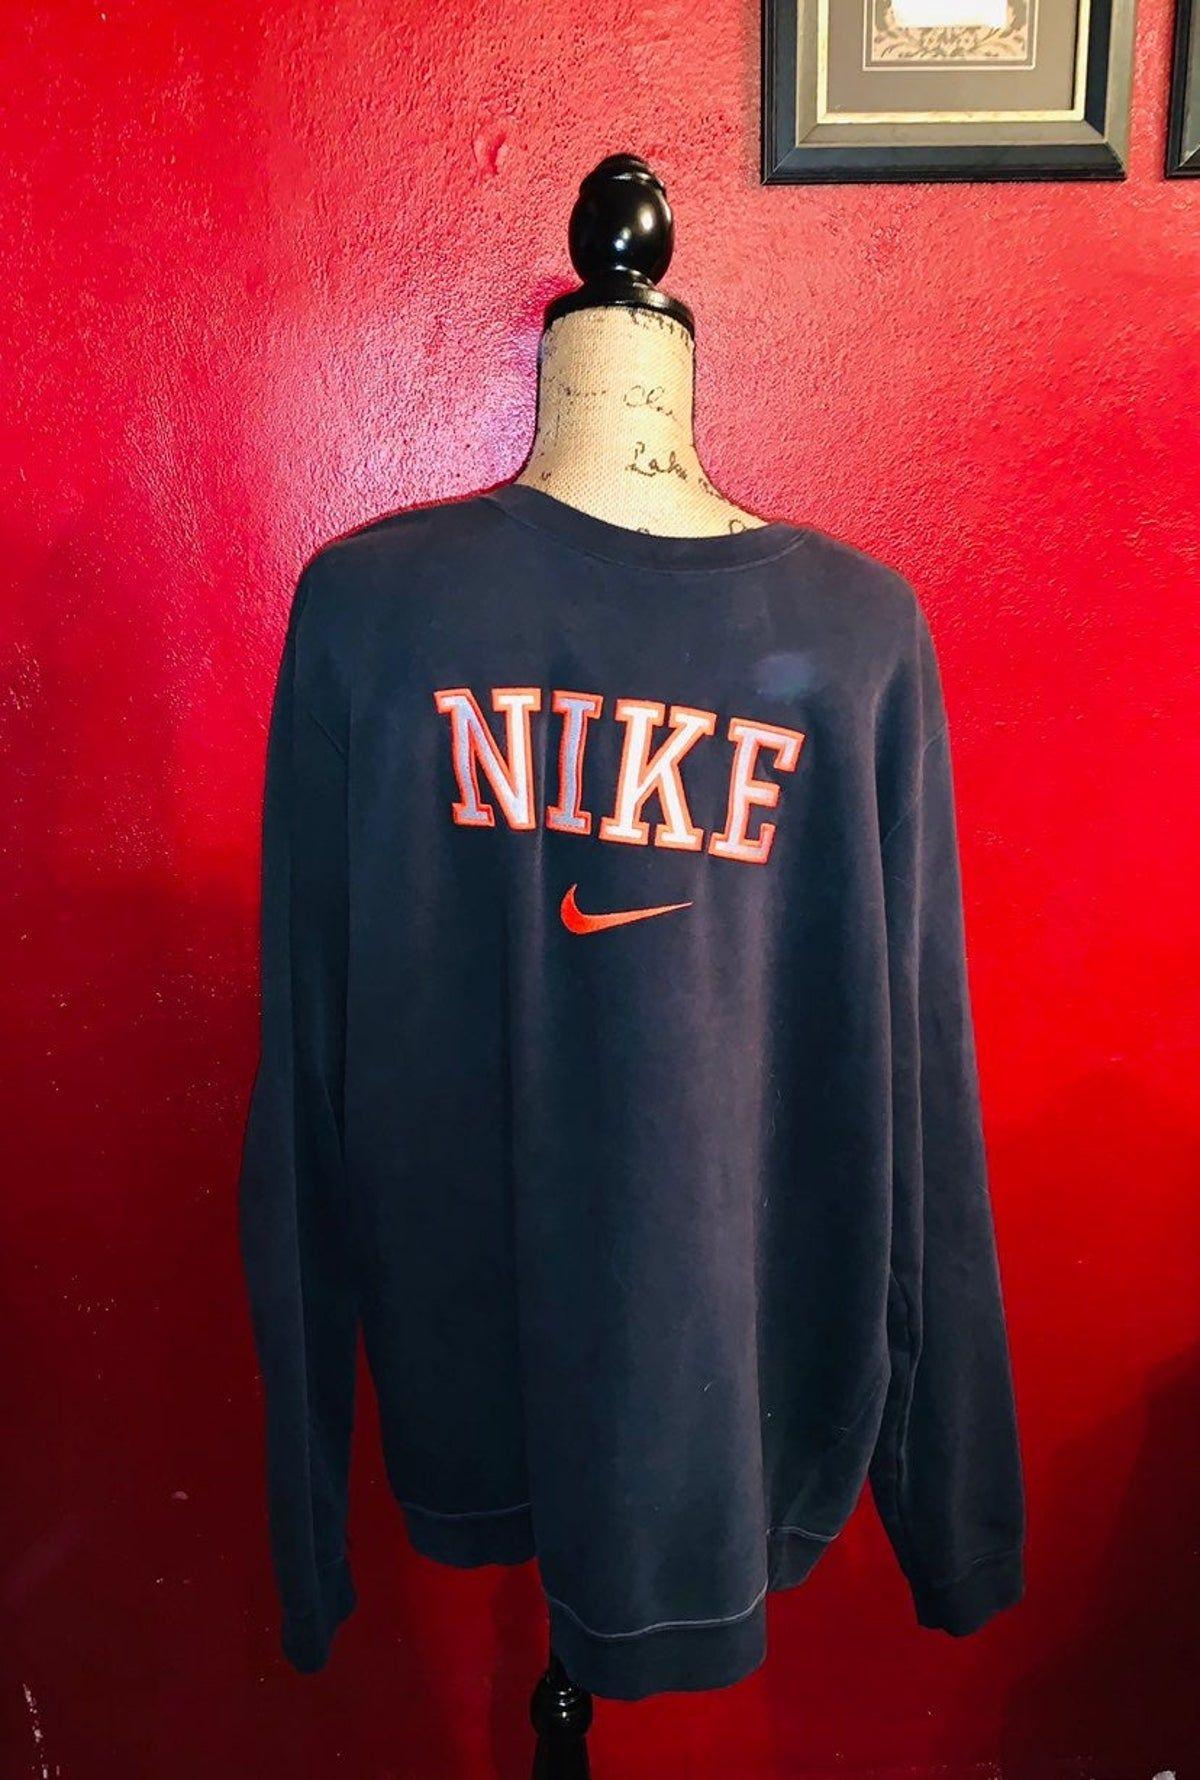 Black Nike Sweatshirt Xxl Black Nike Sweatshirt Sweatshirts Black Nikes [ 1780 x 1200 Pixel ]